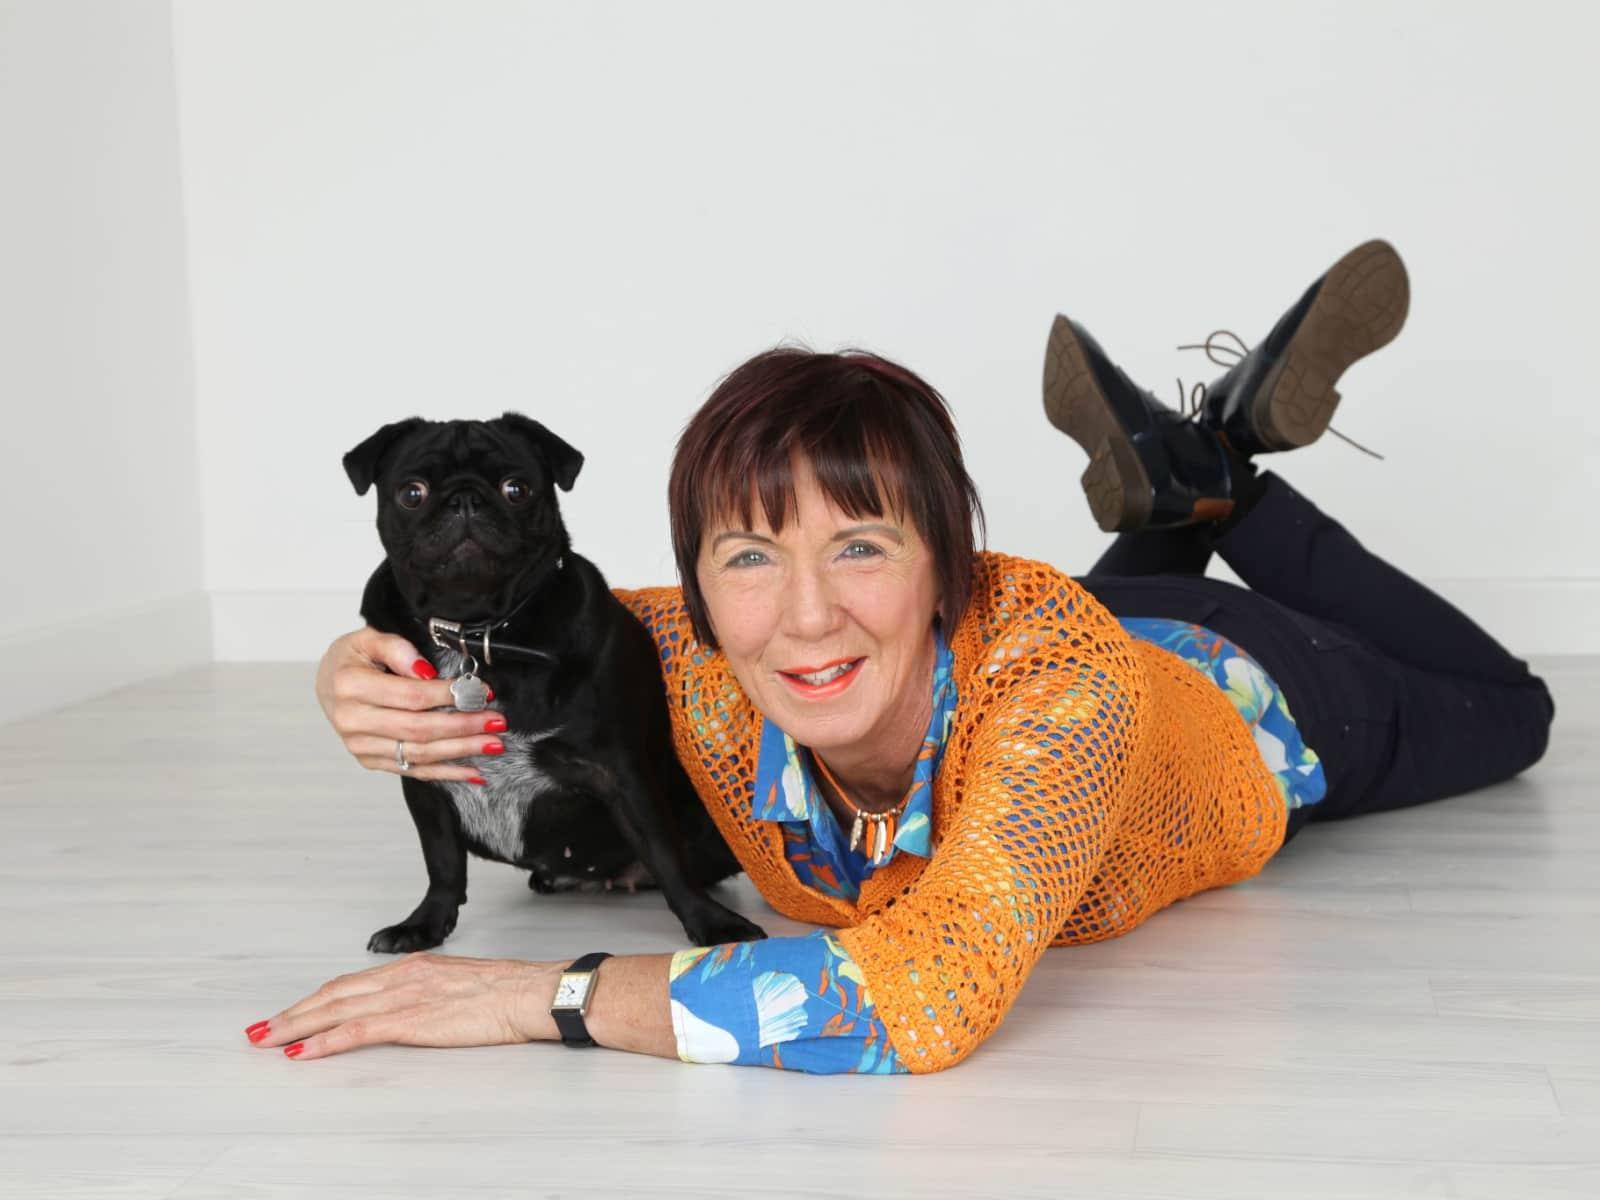 Joan from Glasgow, United Kingdom